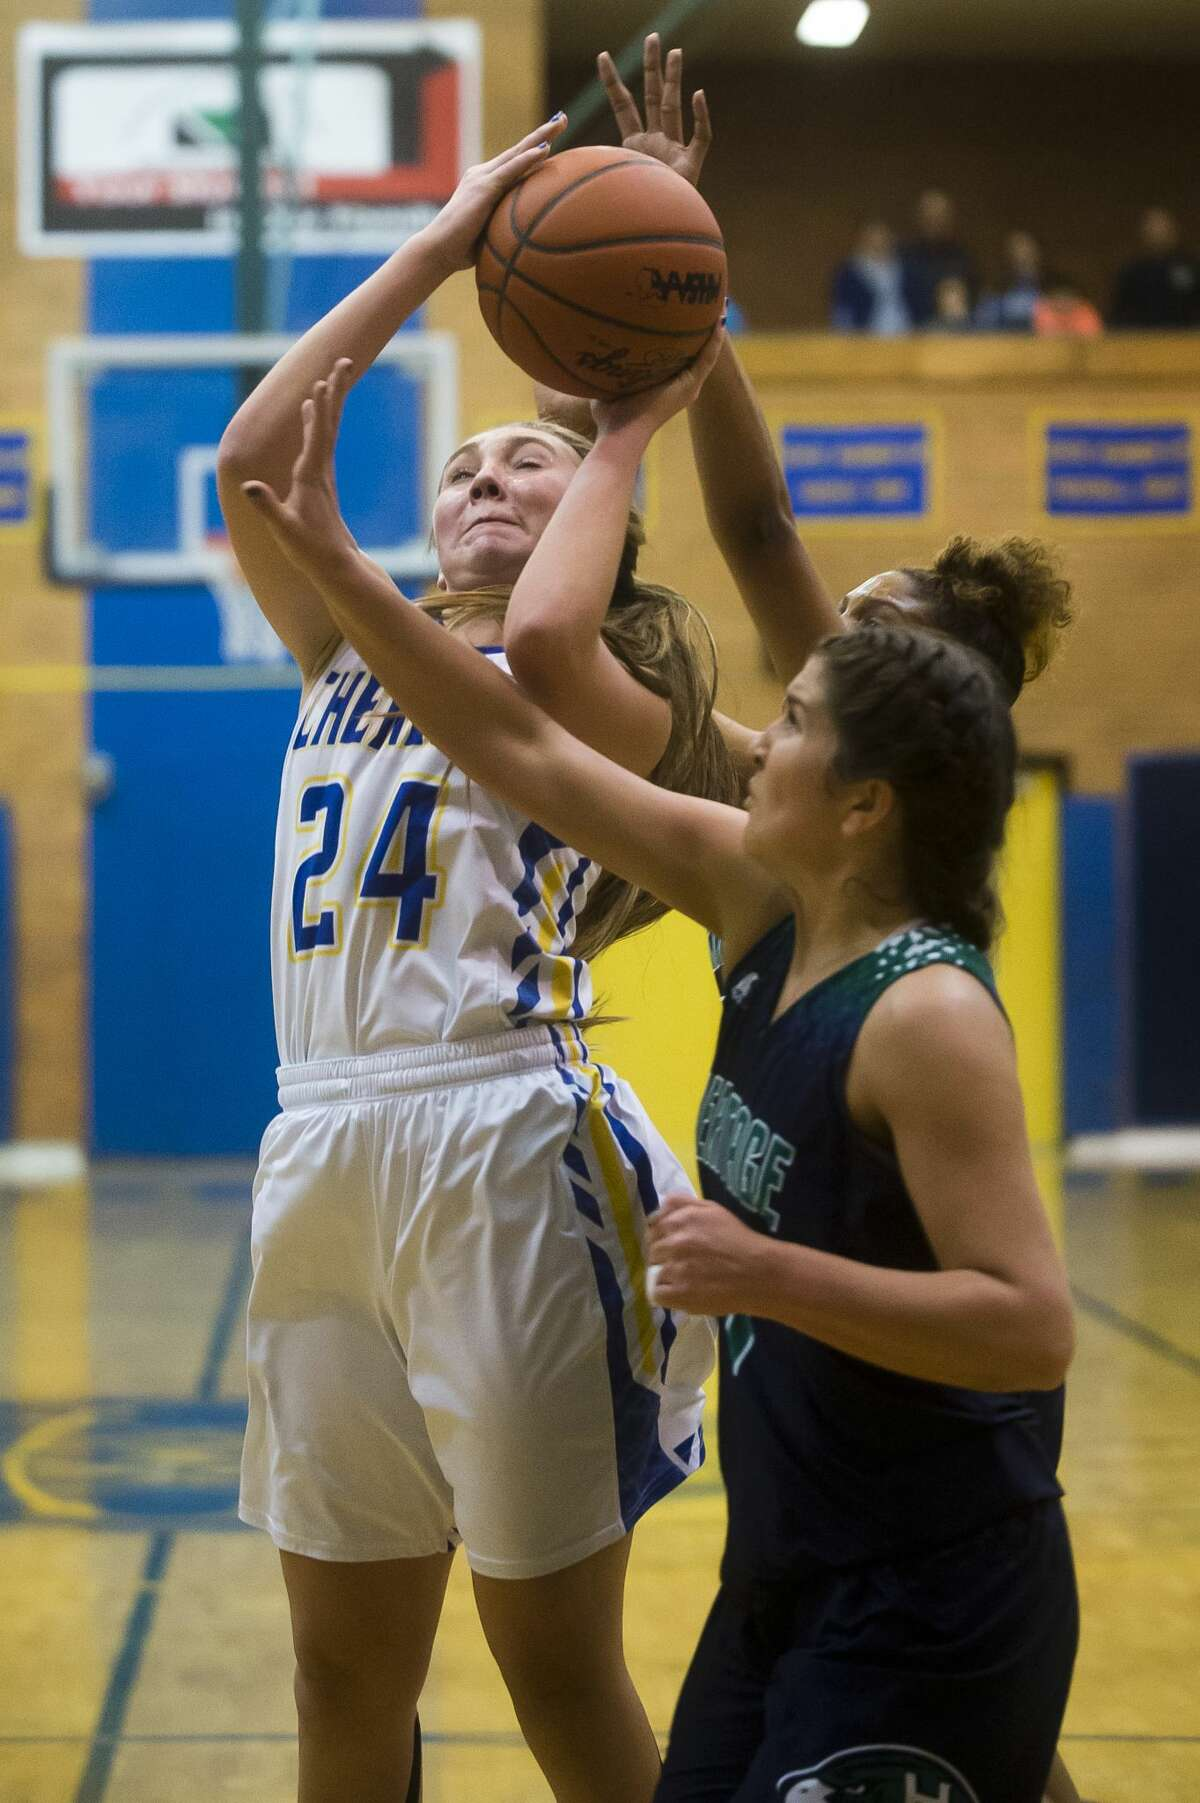 Midland senior Hannah Smith takes a shot during the Chemics' game against Saginaw Heritage on Tuesday, Feb. 6, 2018 at Midland High School. (Katy Kildee/kkildee@mdn.net)